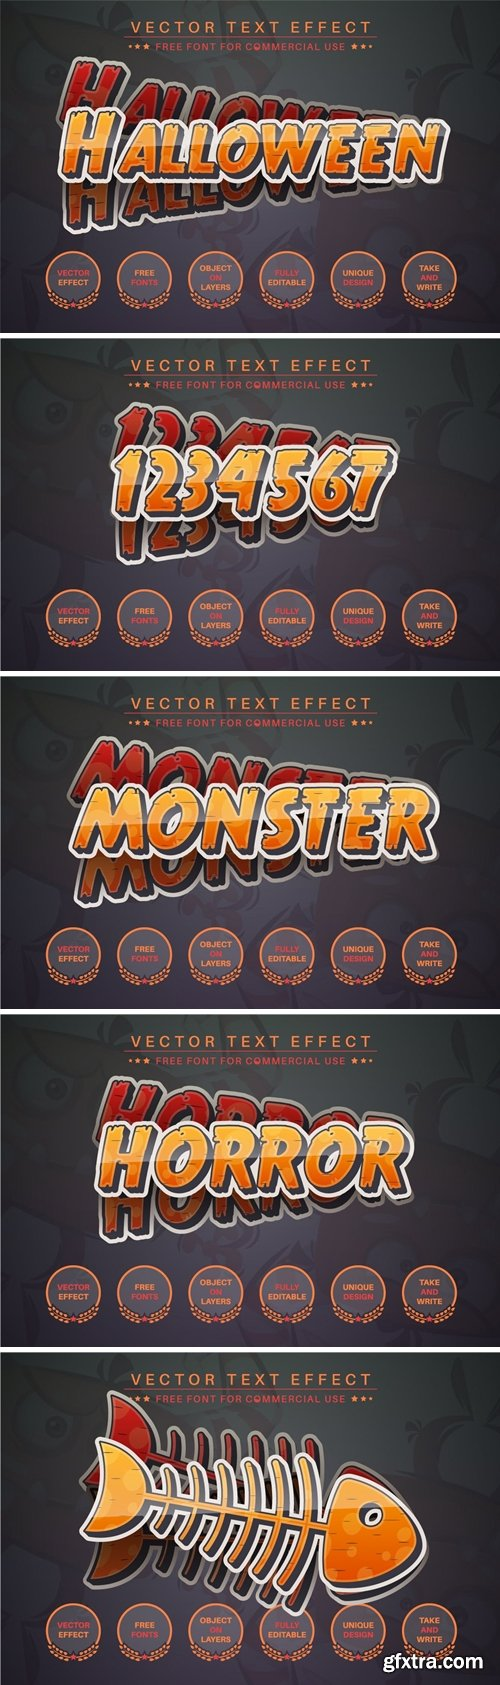 Halloween - Editable Text Effect, Font Style